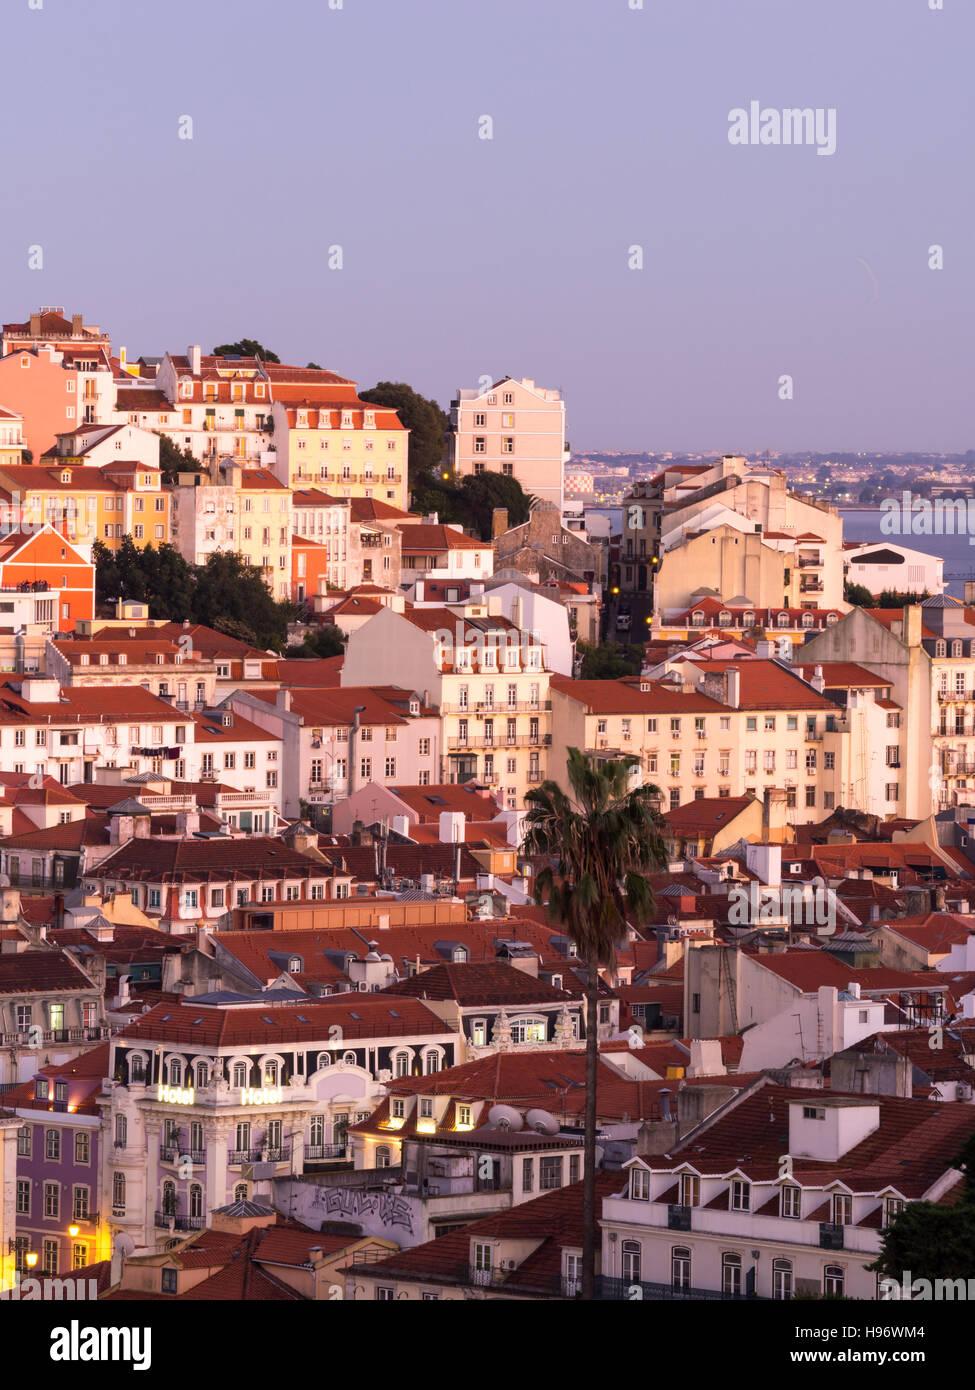 Cityscape of Lisbon, Portugal, seen from Miradouro Sao Pedro de Alcantara at sunset. - Stock Image